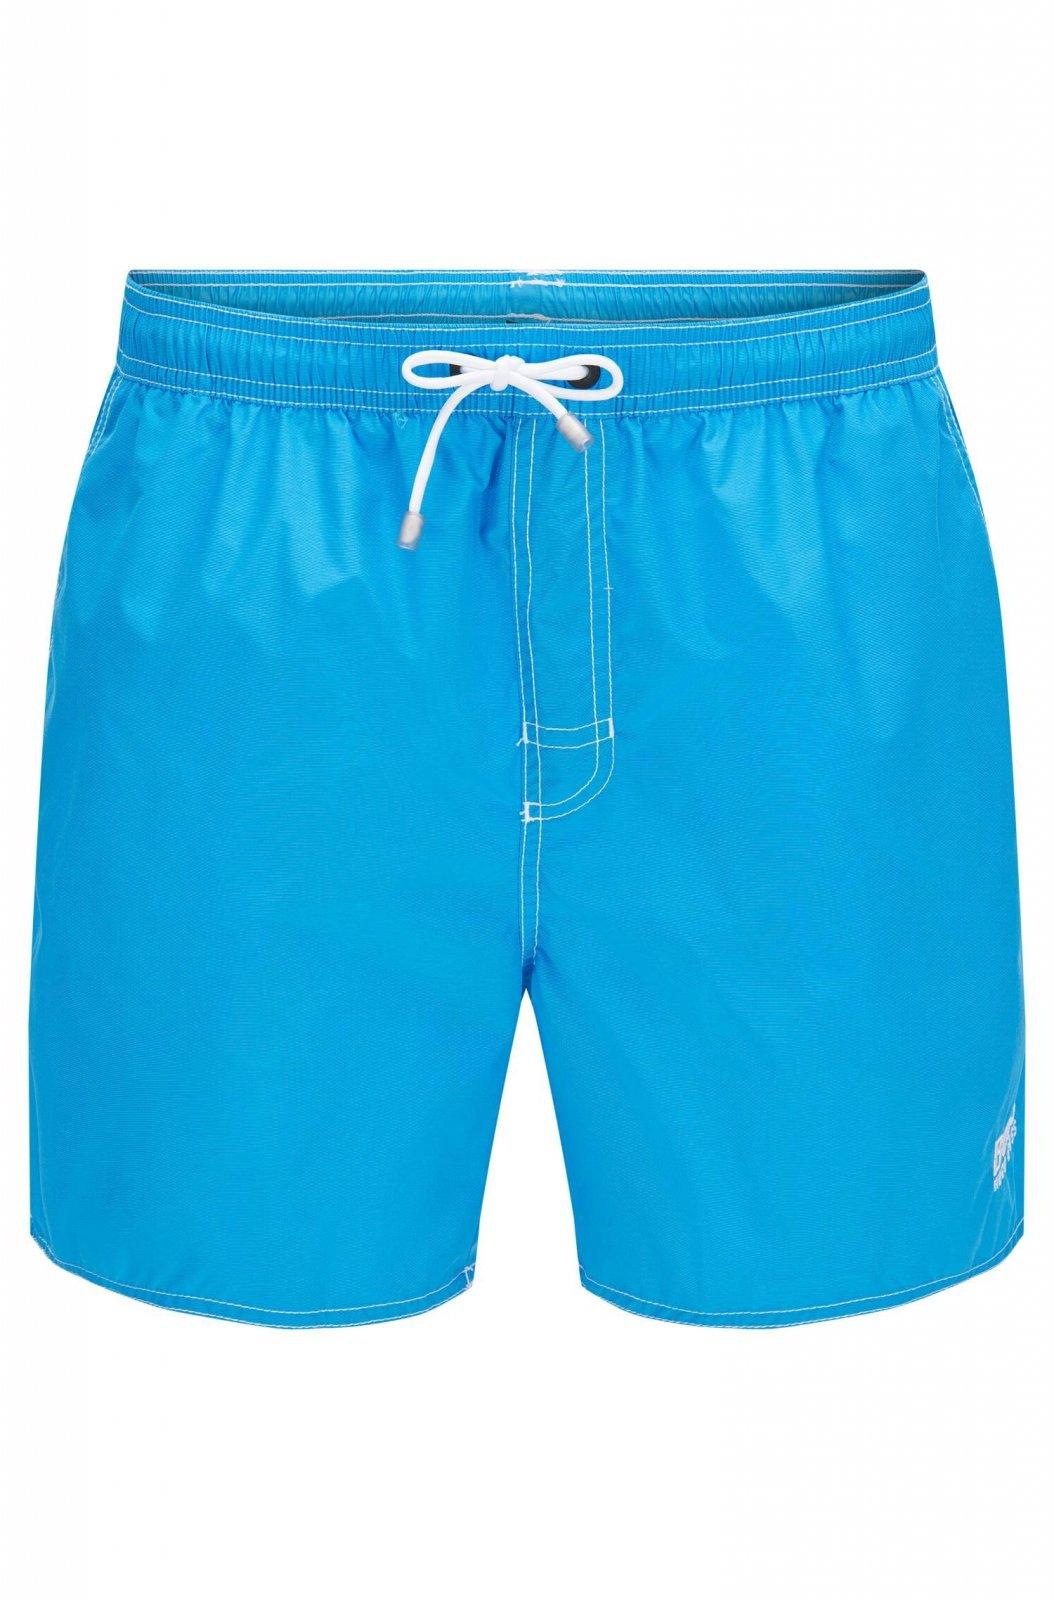 47fd57d8e64 HUGO BOSS Short de bain Lobster bleu ciel - 50332322